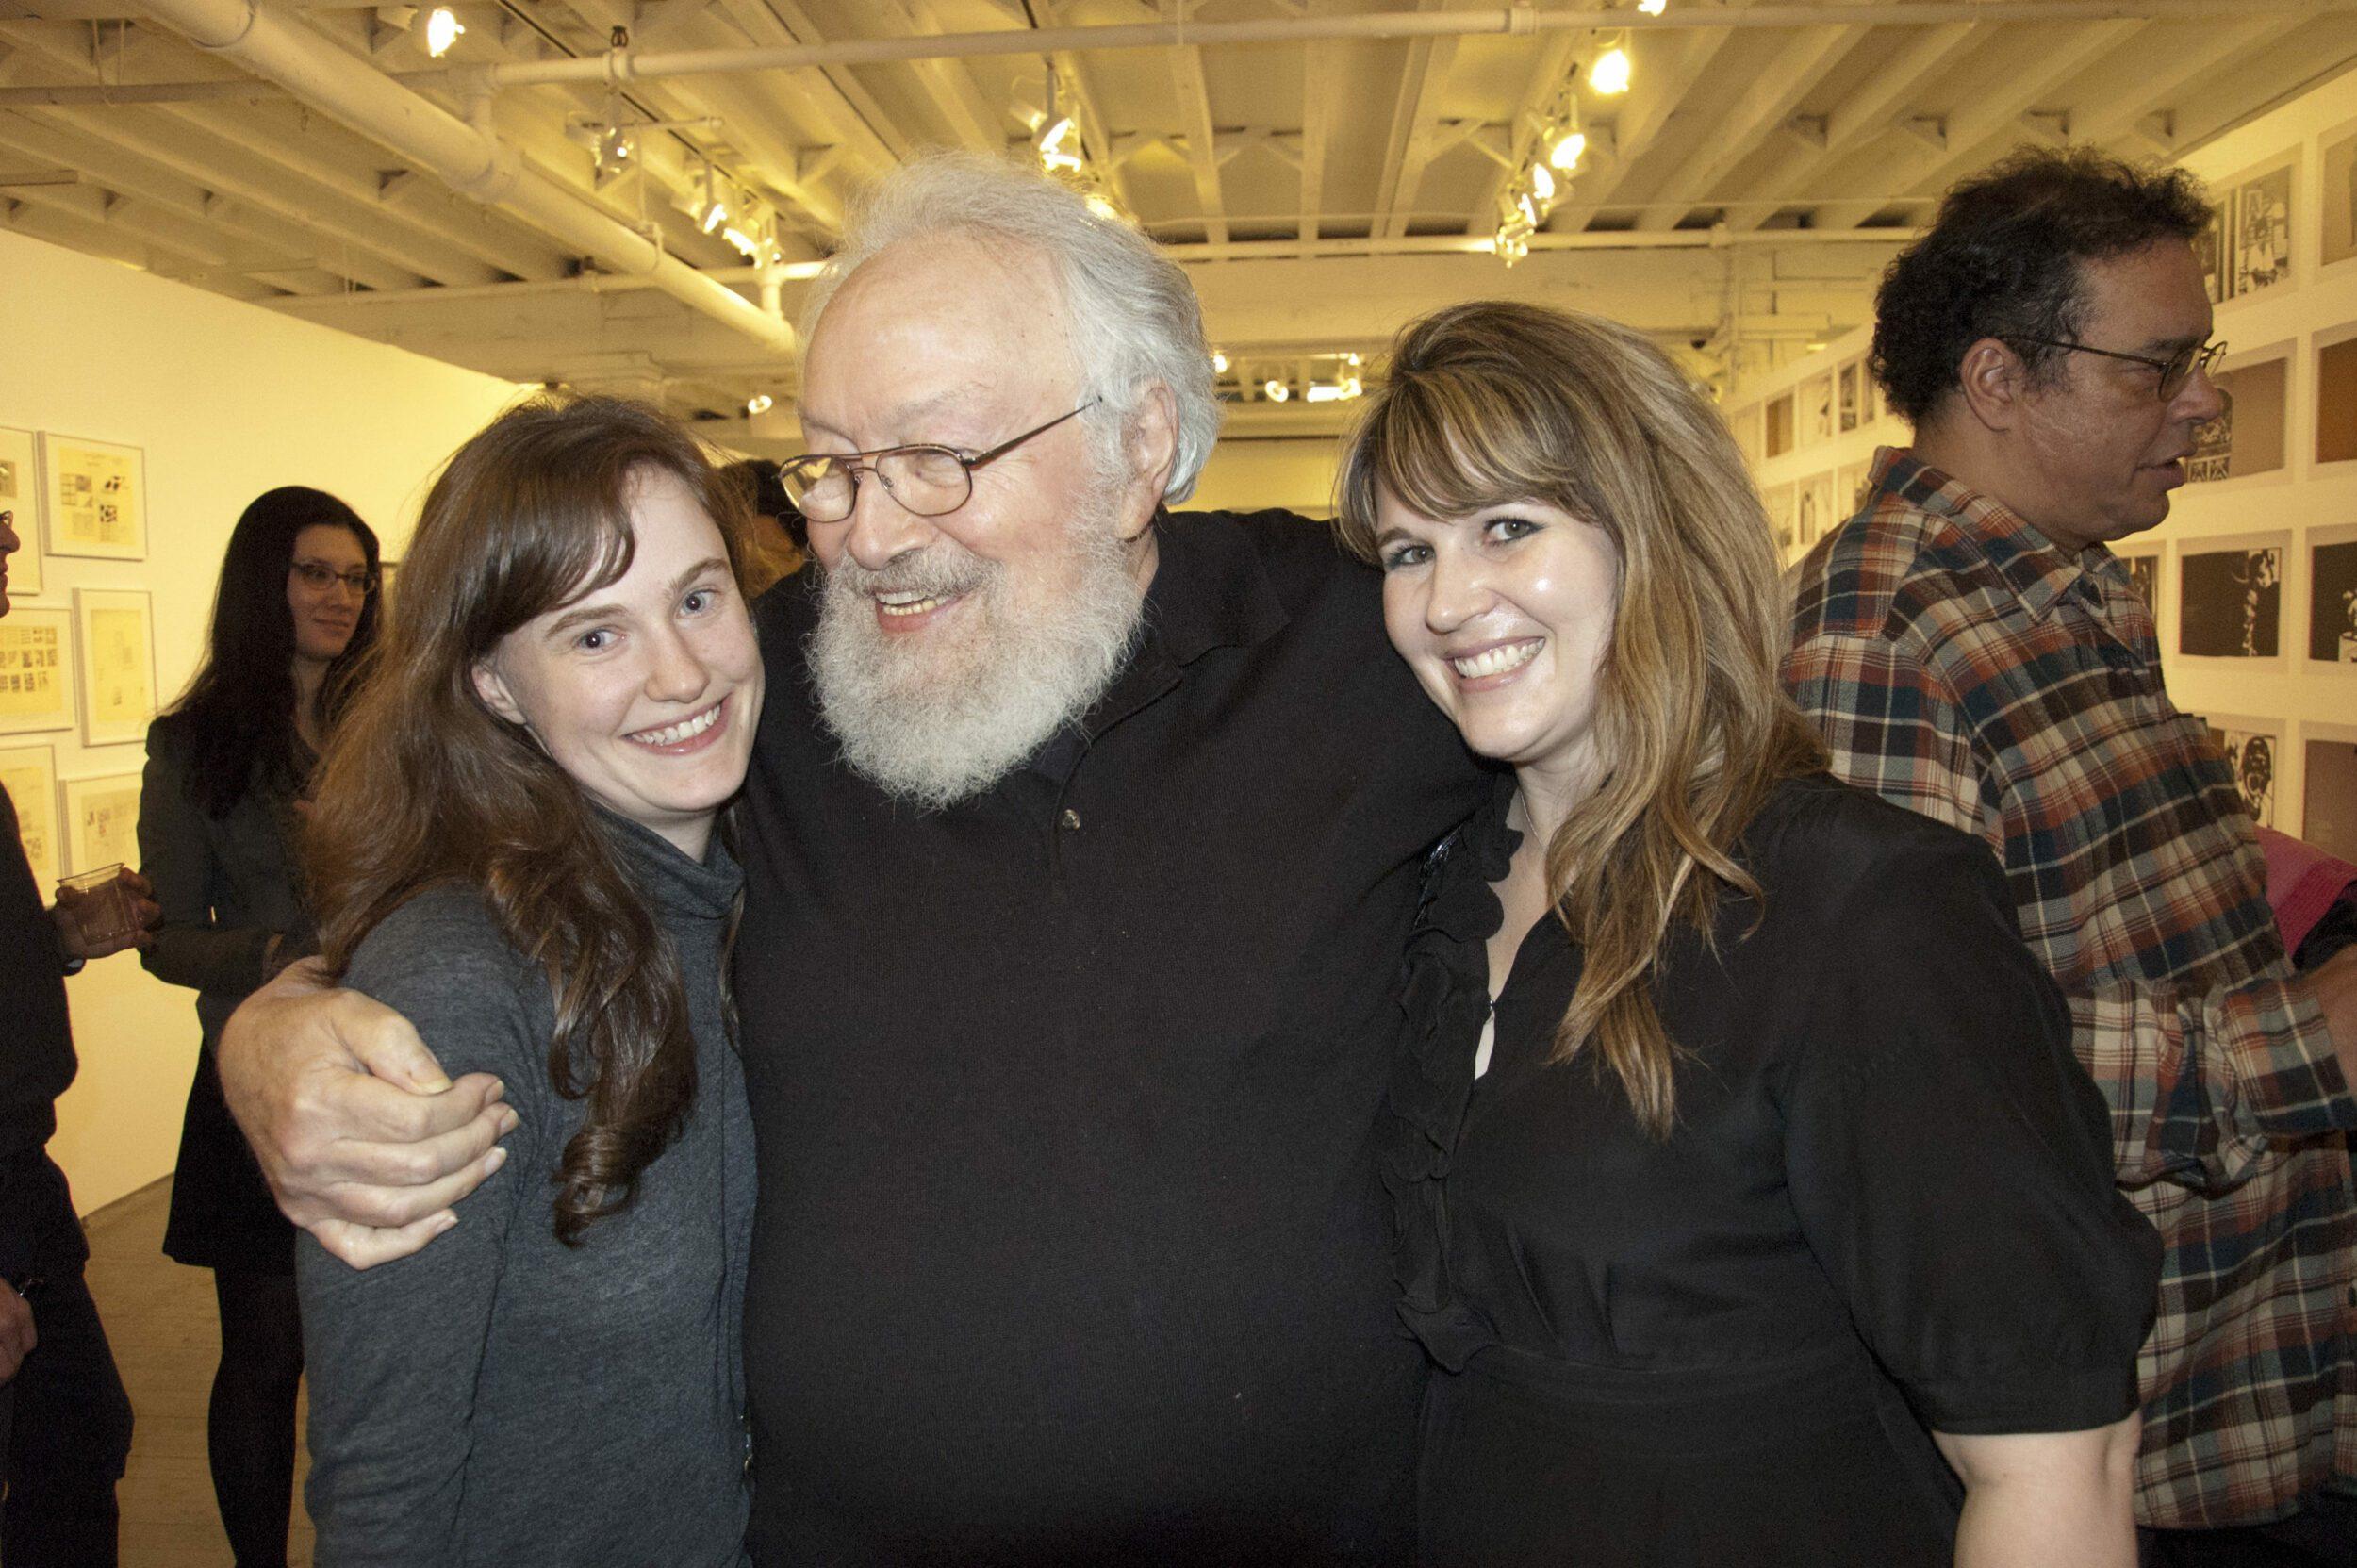 And more beautiful women -- Priscilla Kavanaugh and Beth Rigler